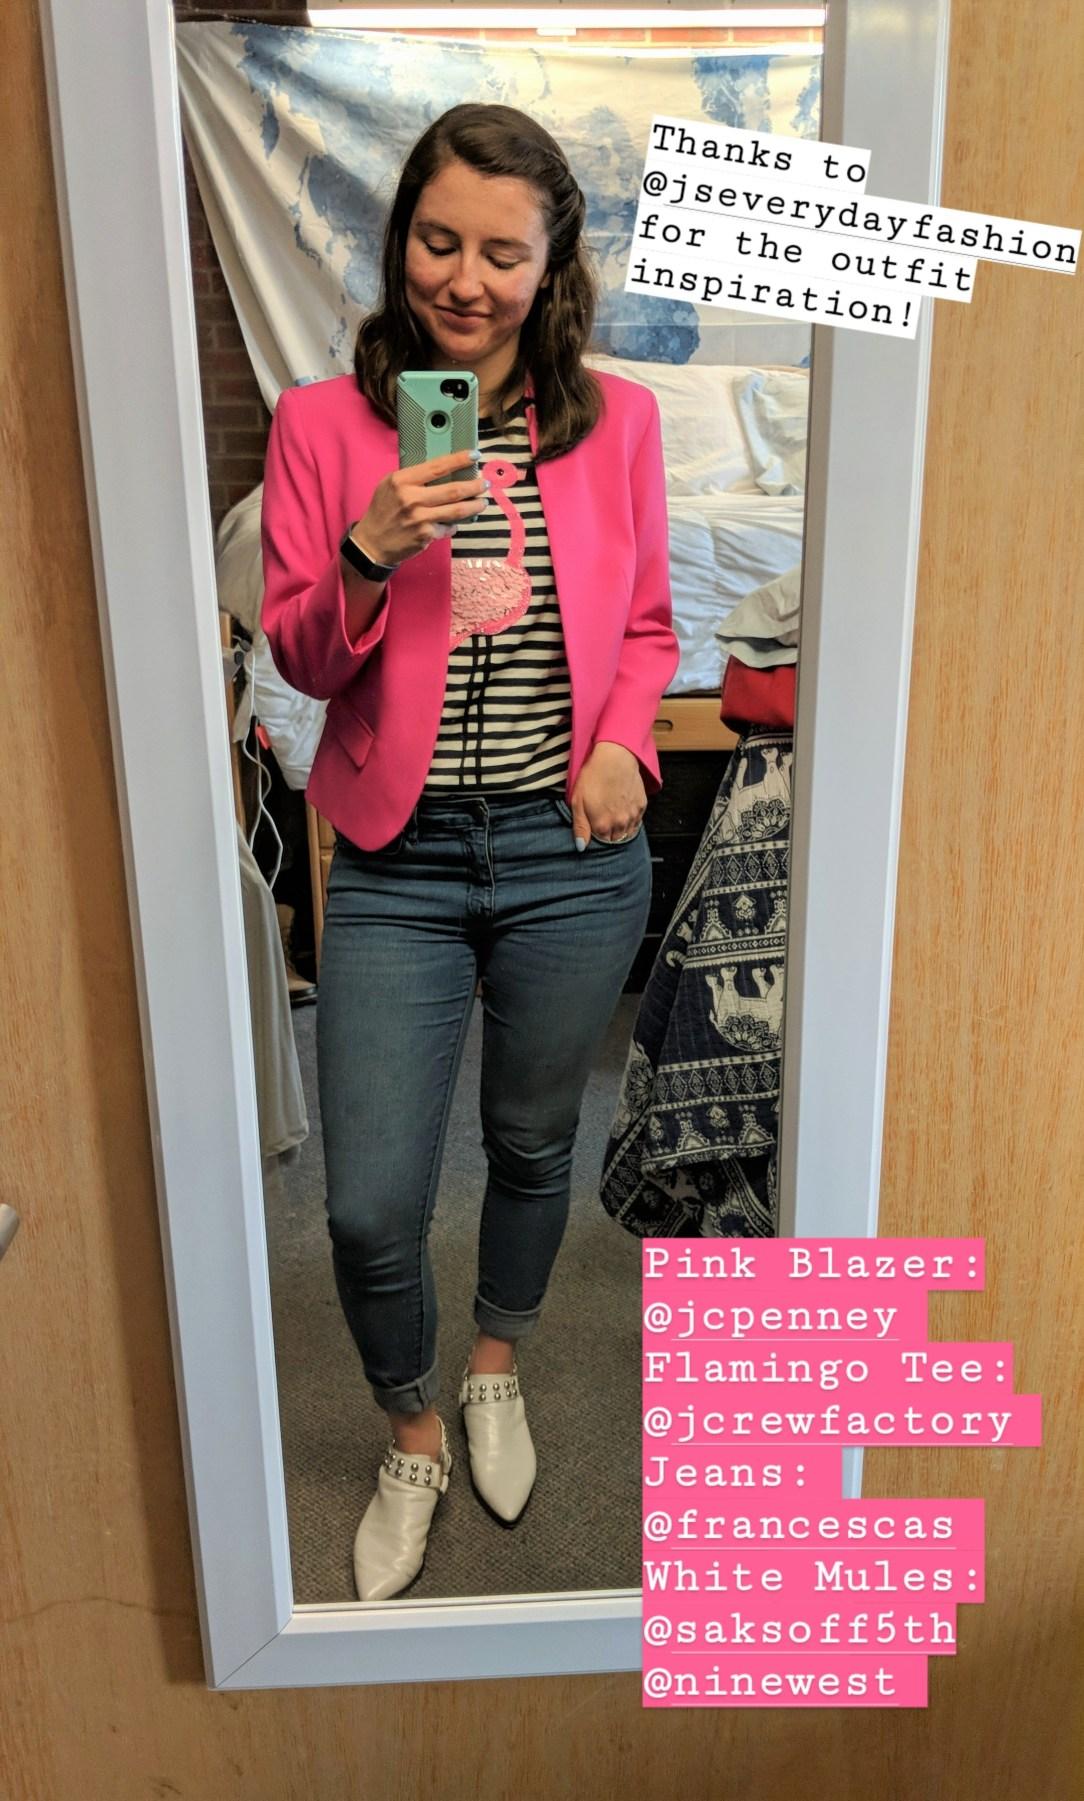 striped flamingo tee, pink blazer, skinny jeans, white mules